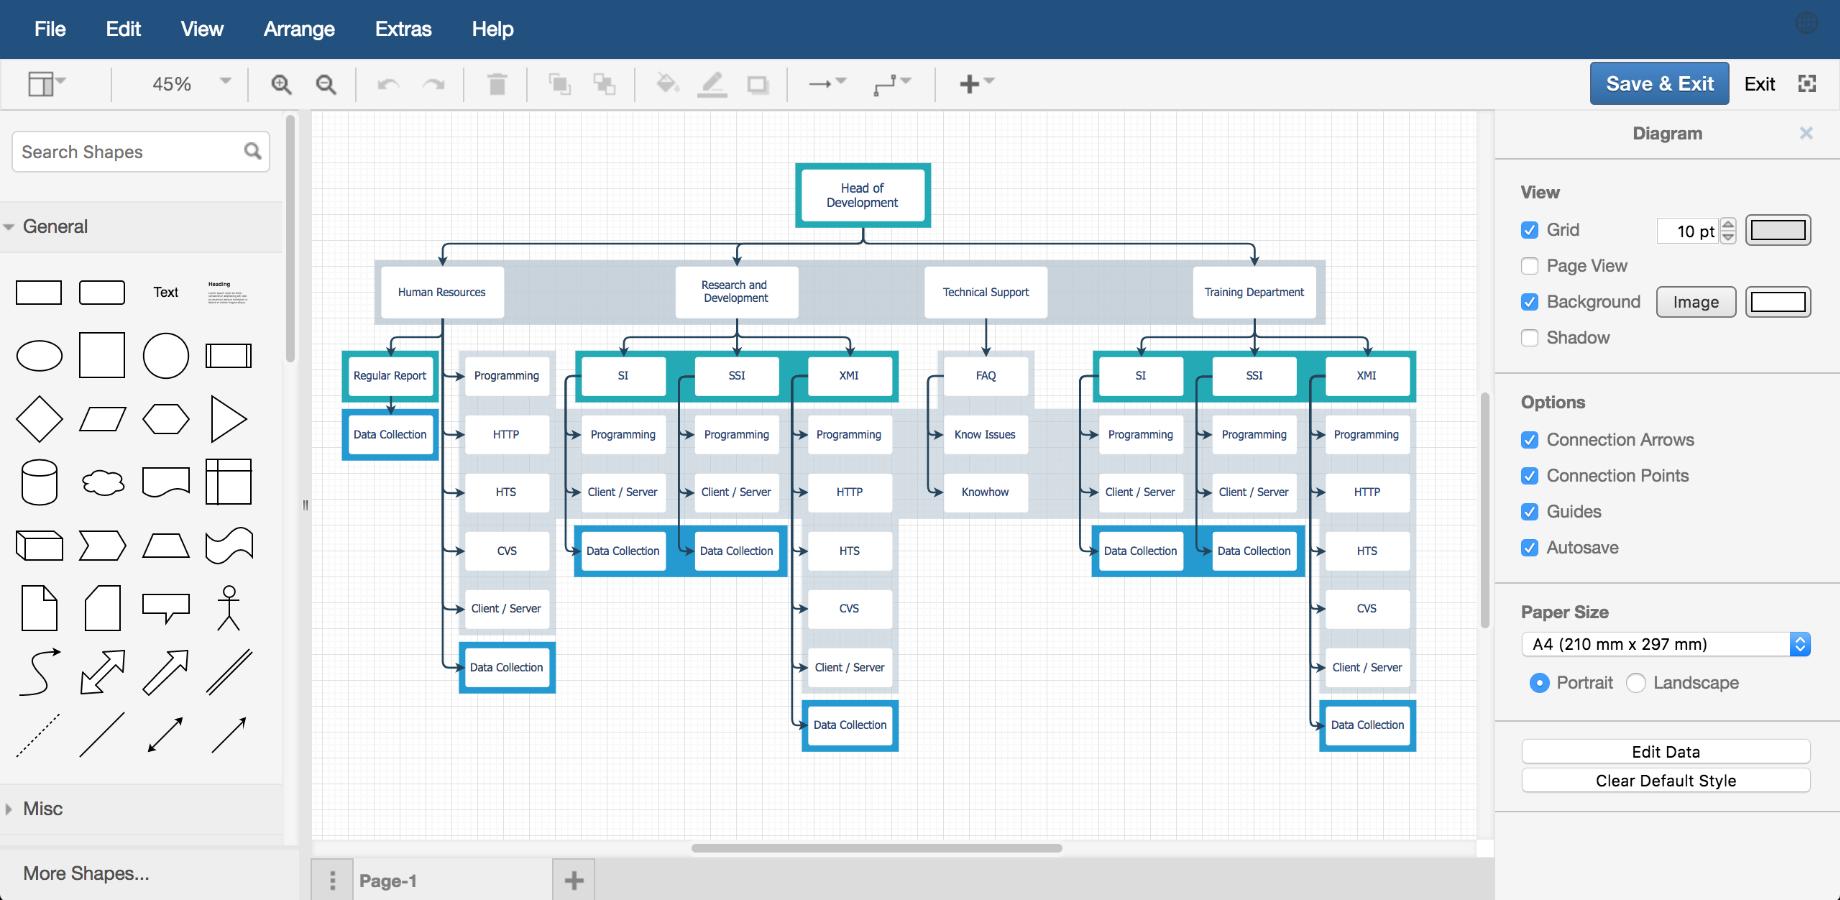 Draw.io Diagrams For Jira | Atlassian Marketplace inside Er-X Block Diagram